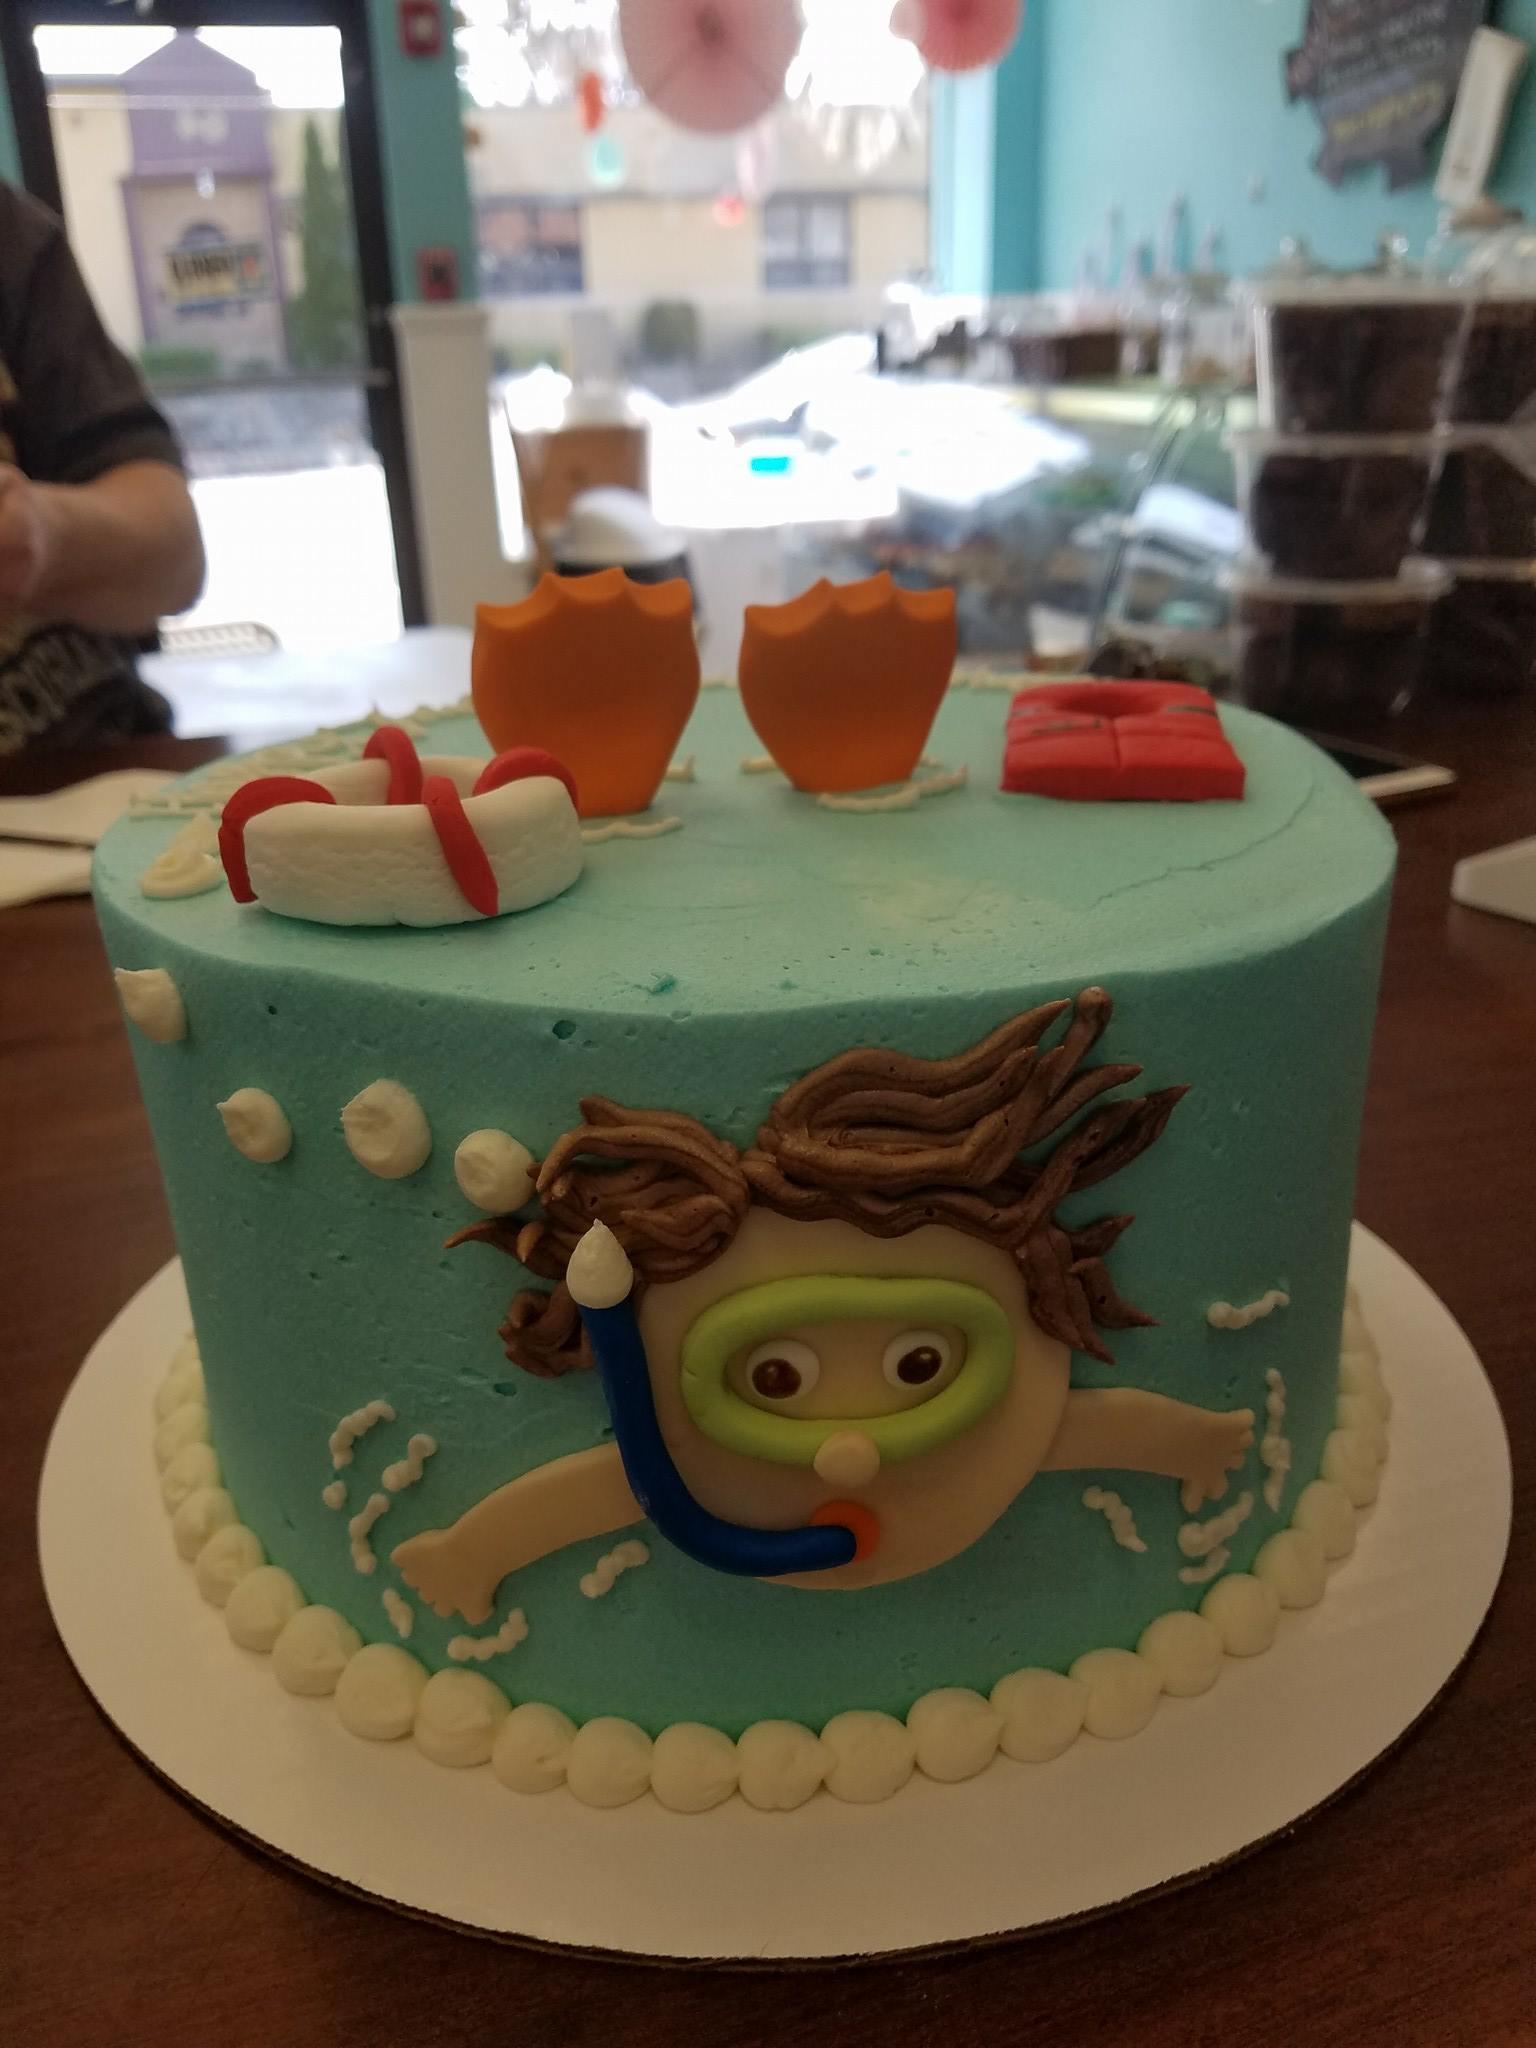 cake, snorkel, water, ocean